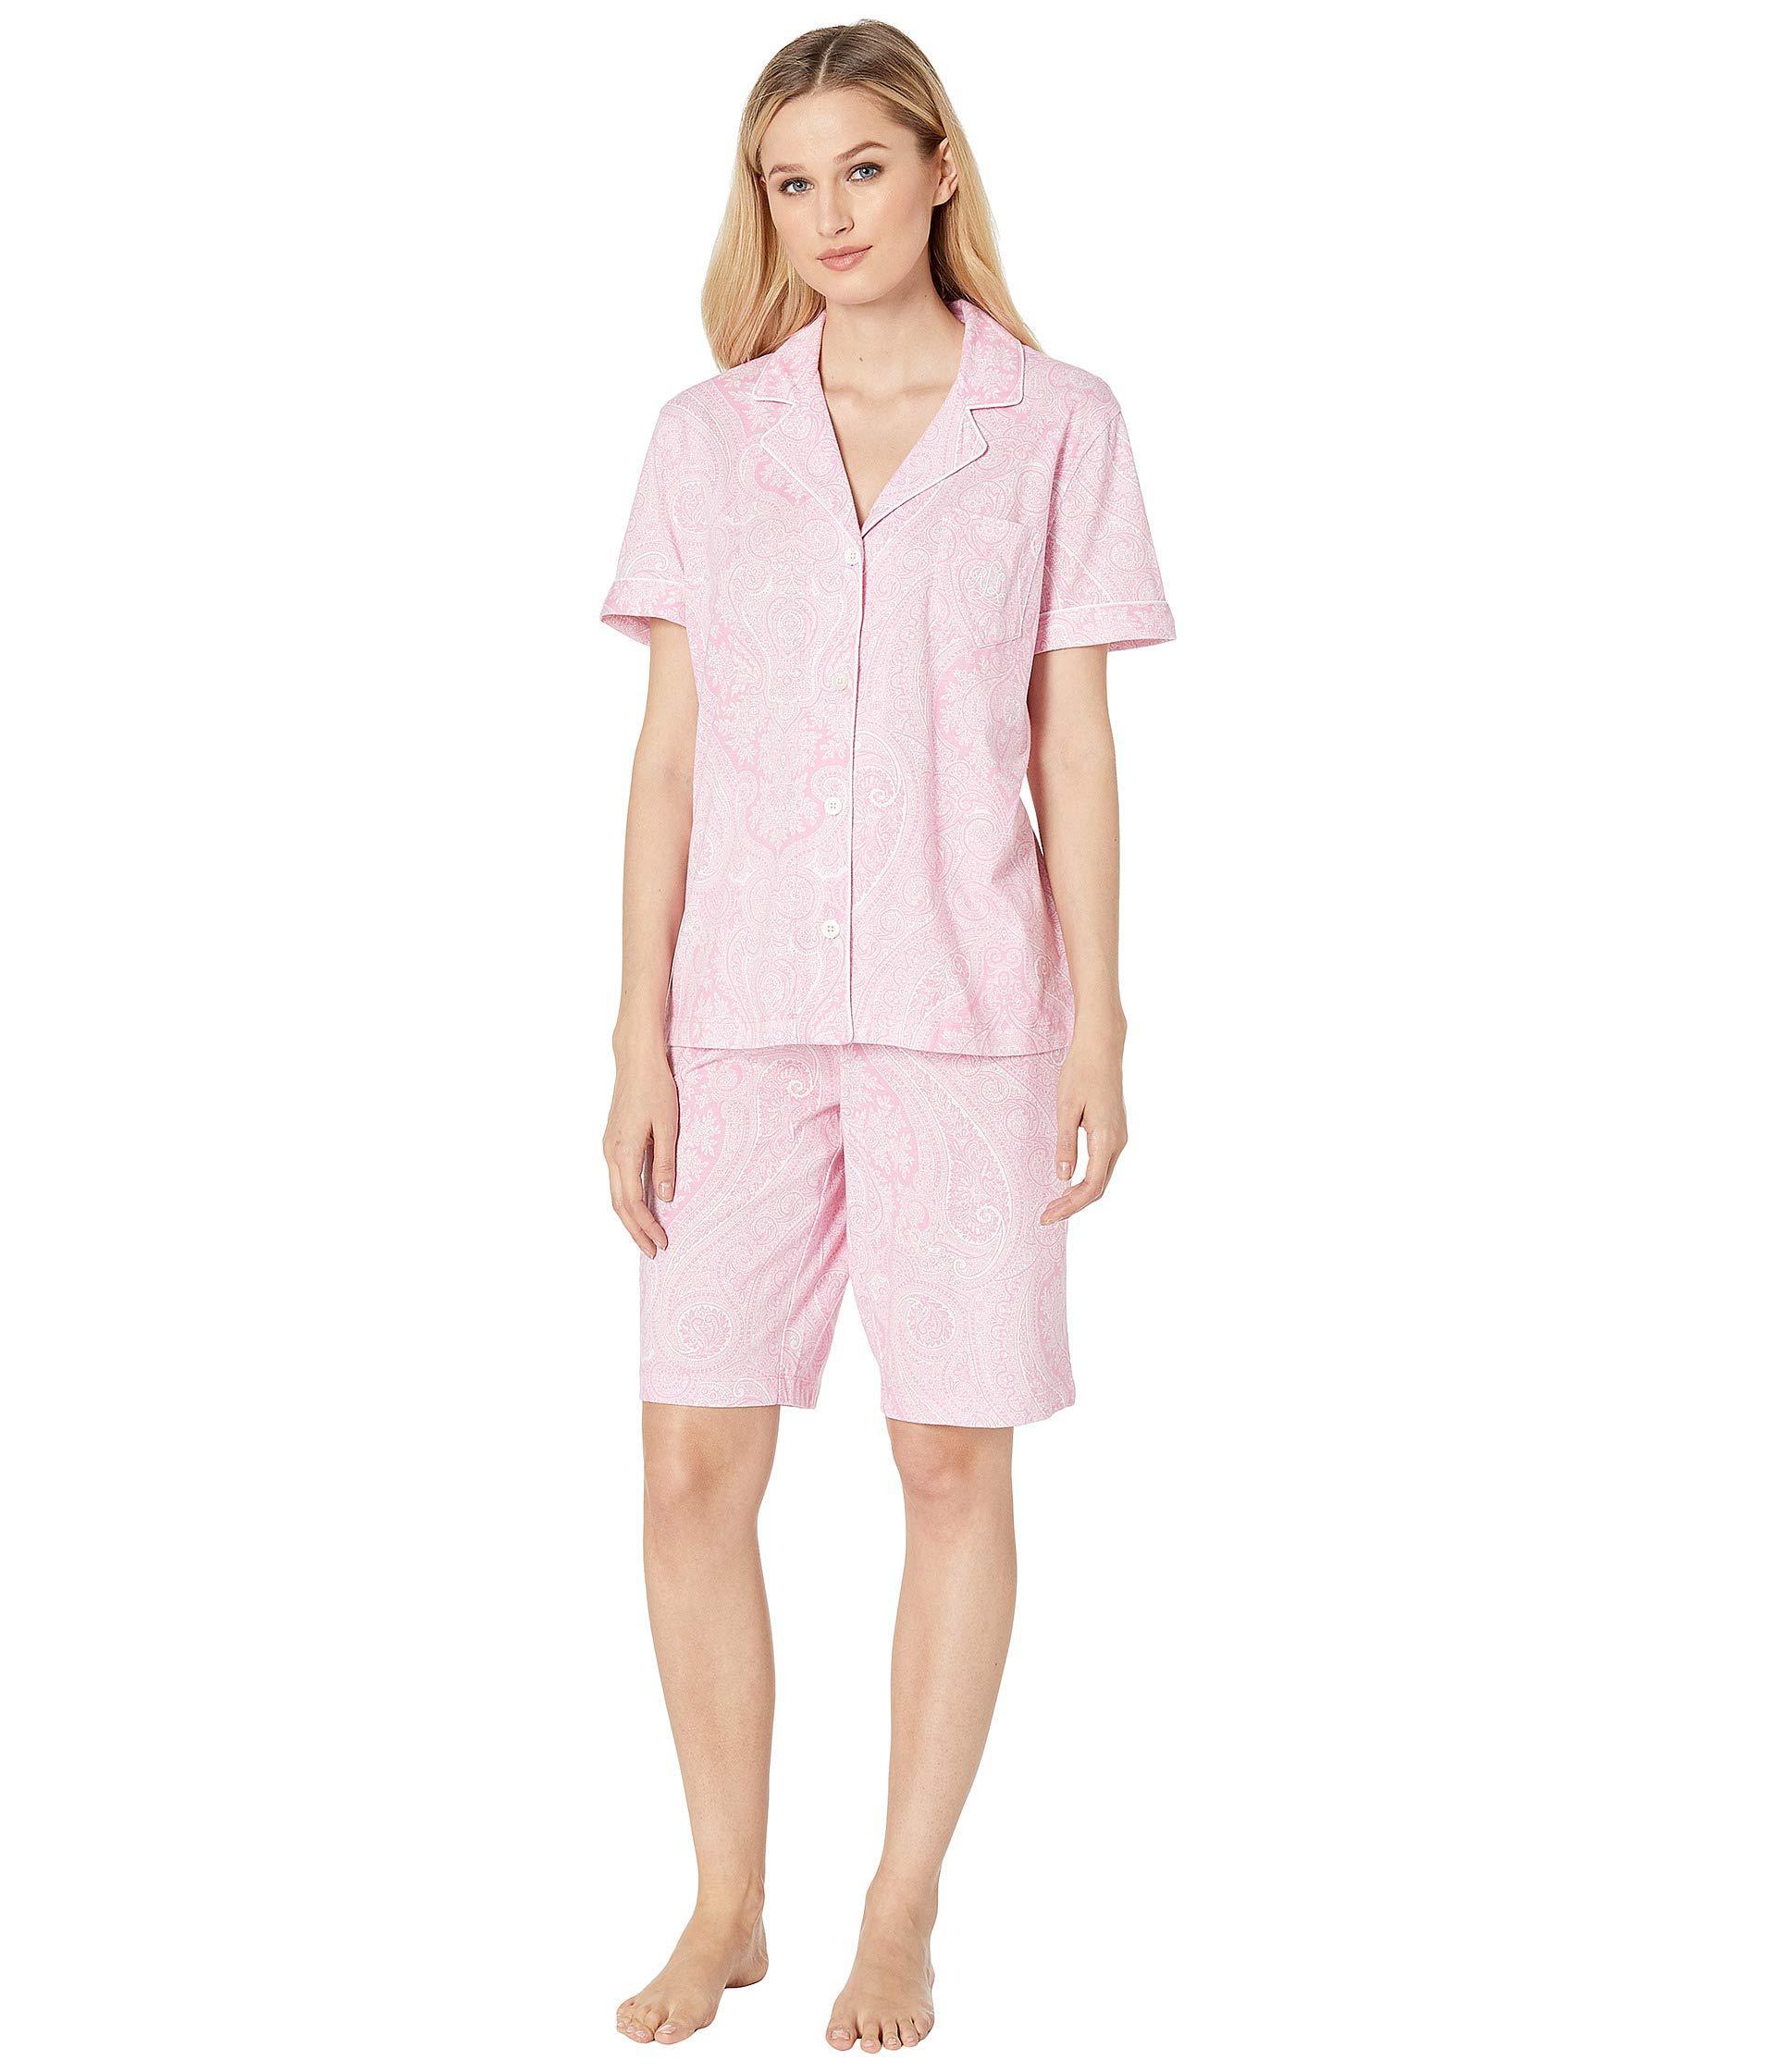 ea7896e3c7 Lyst - Lauren by Ralph Lauren Short Sleeve Notch Collar Bermuda Pj ...